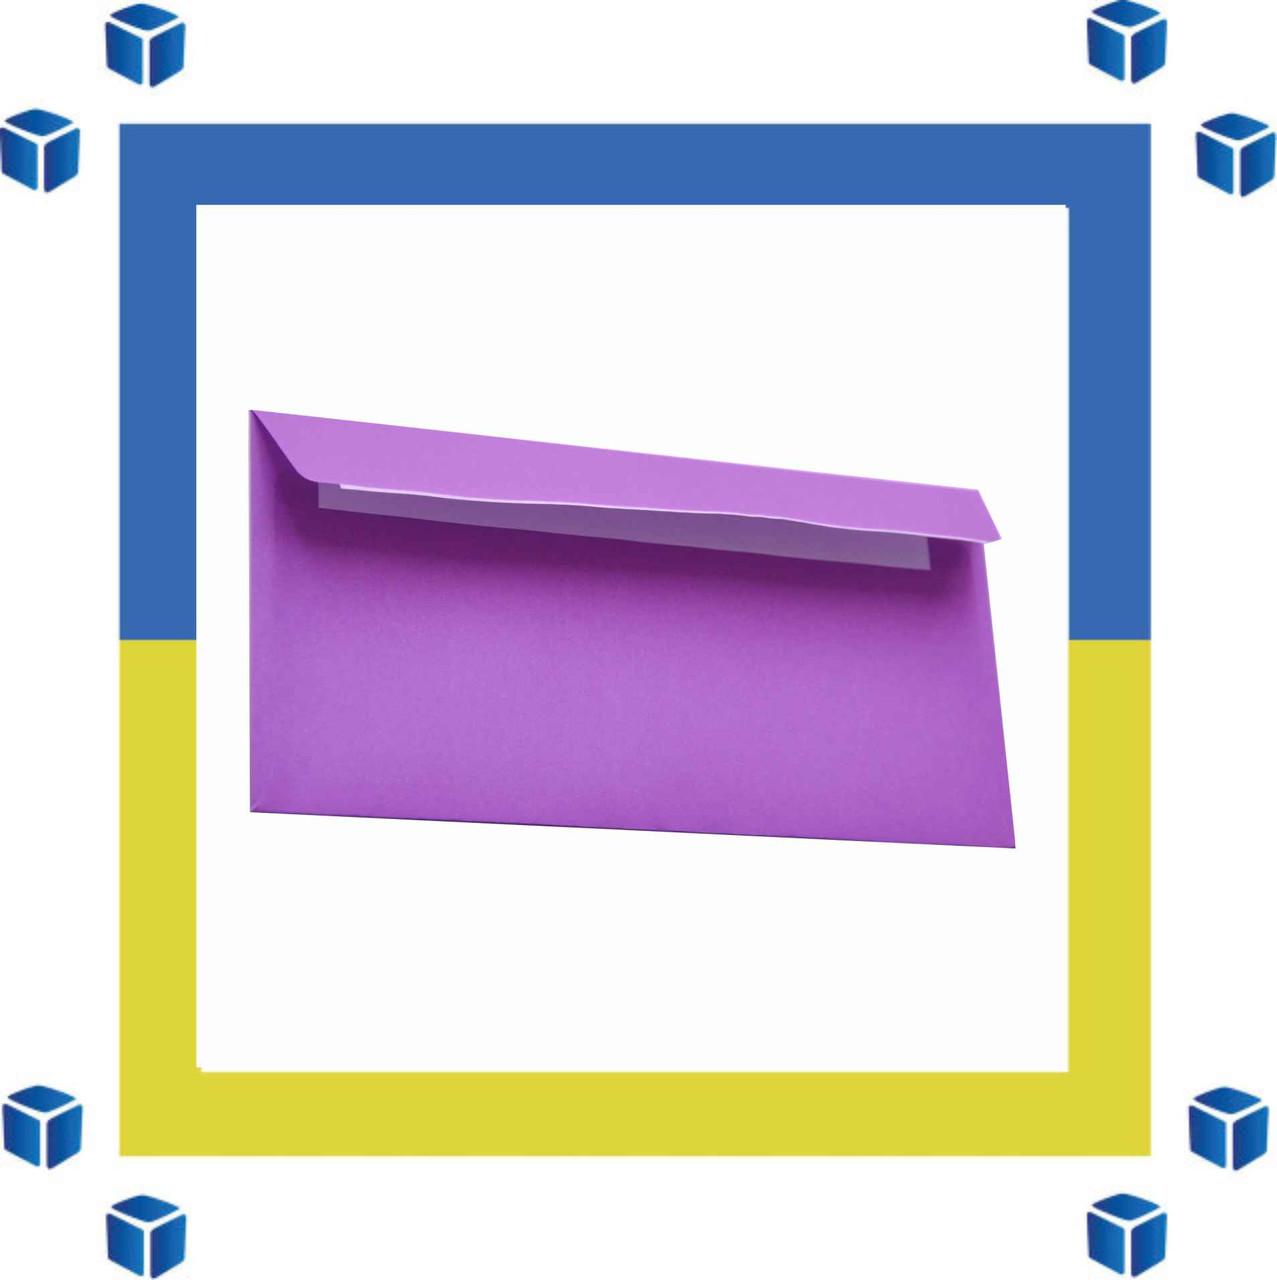 Конверты Е65 (DL) (110х220) скл, фиолетовый (0+0)